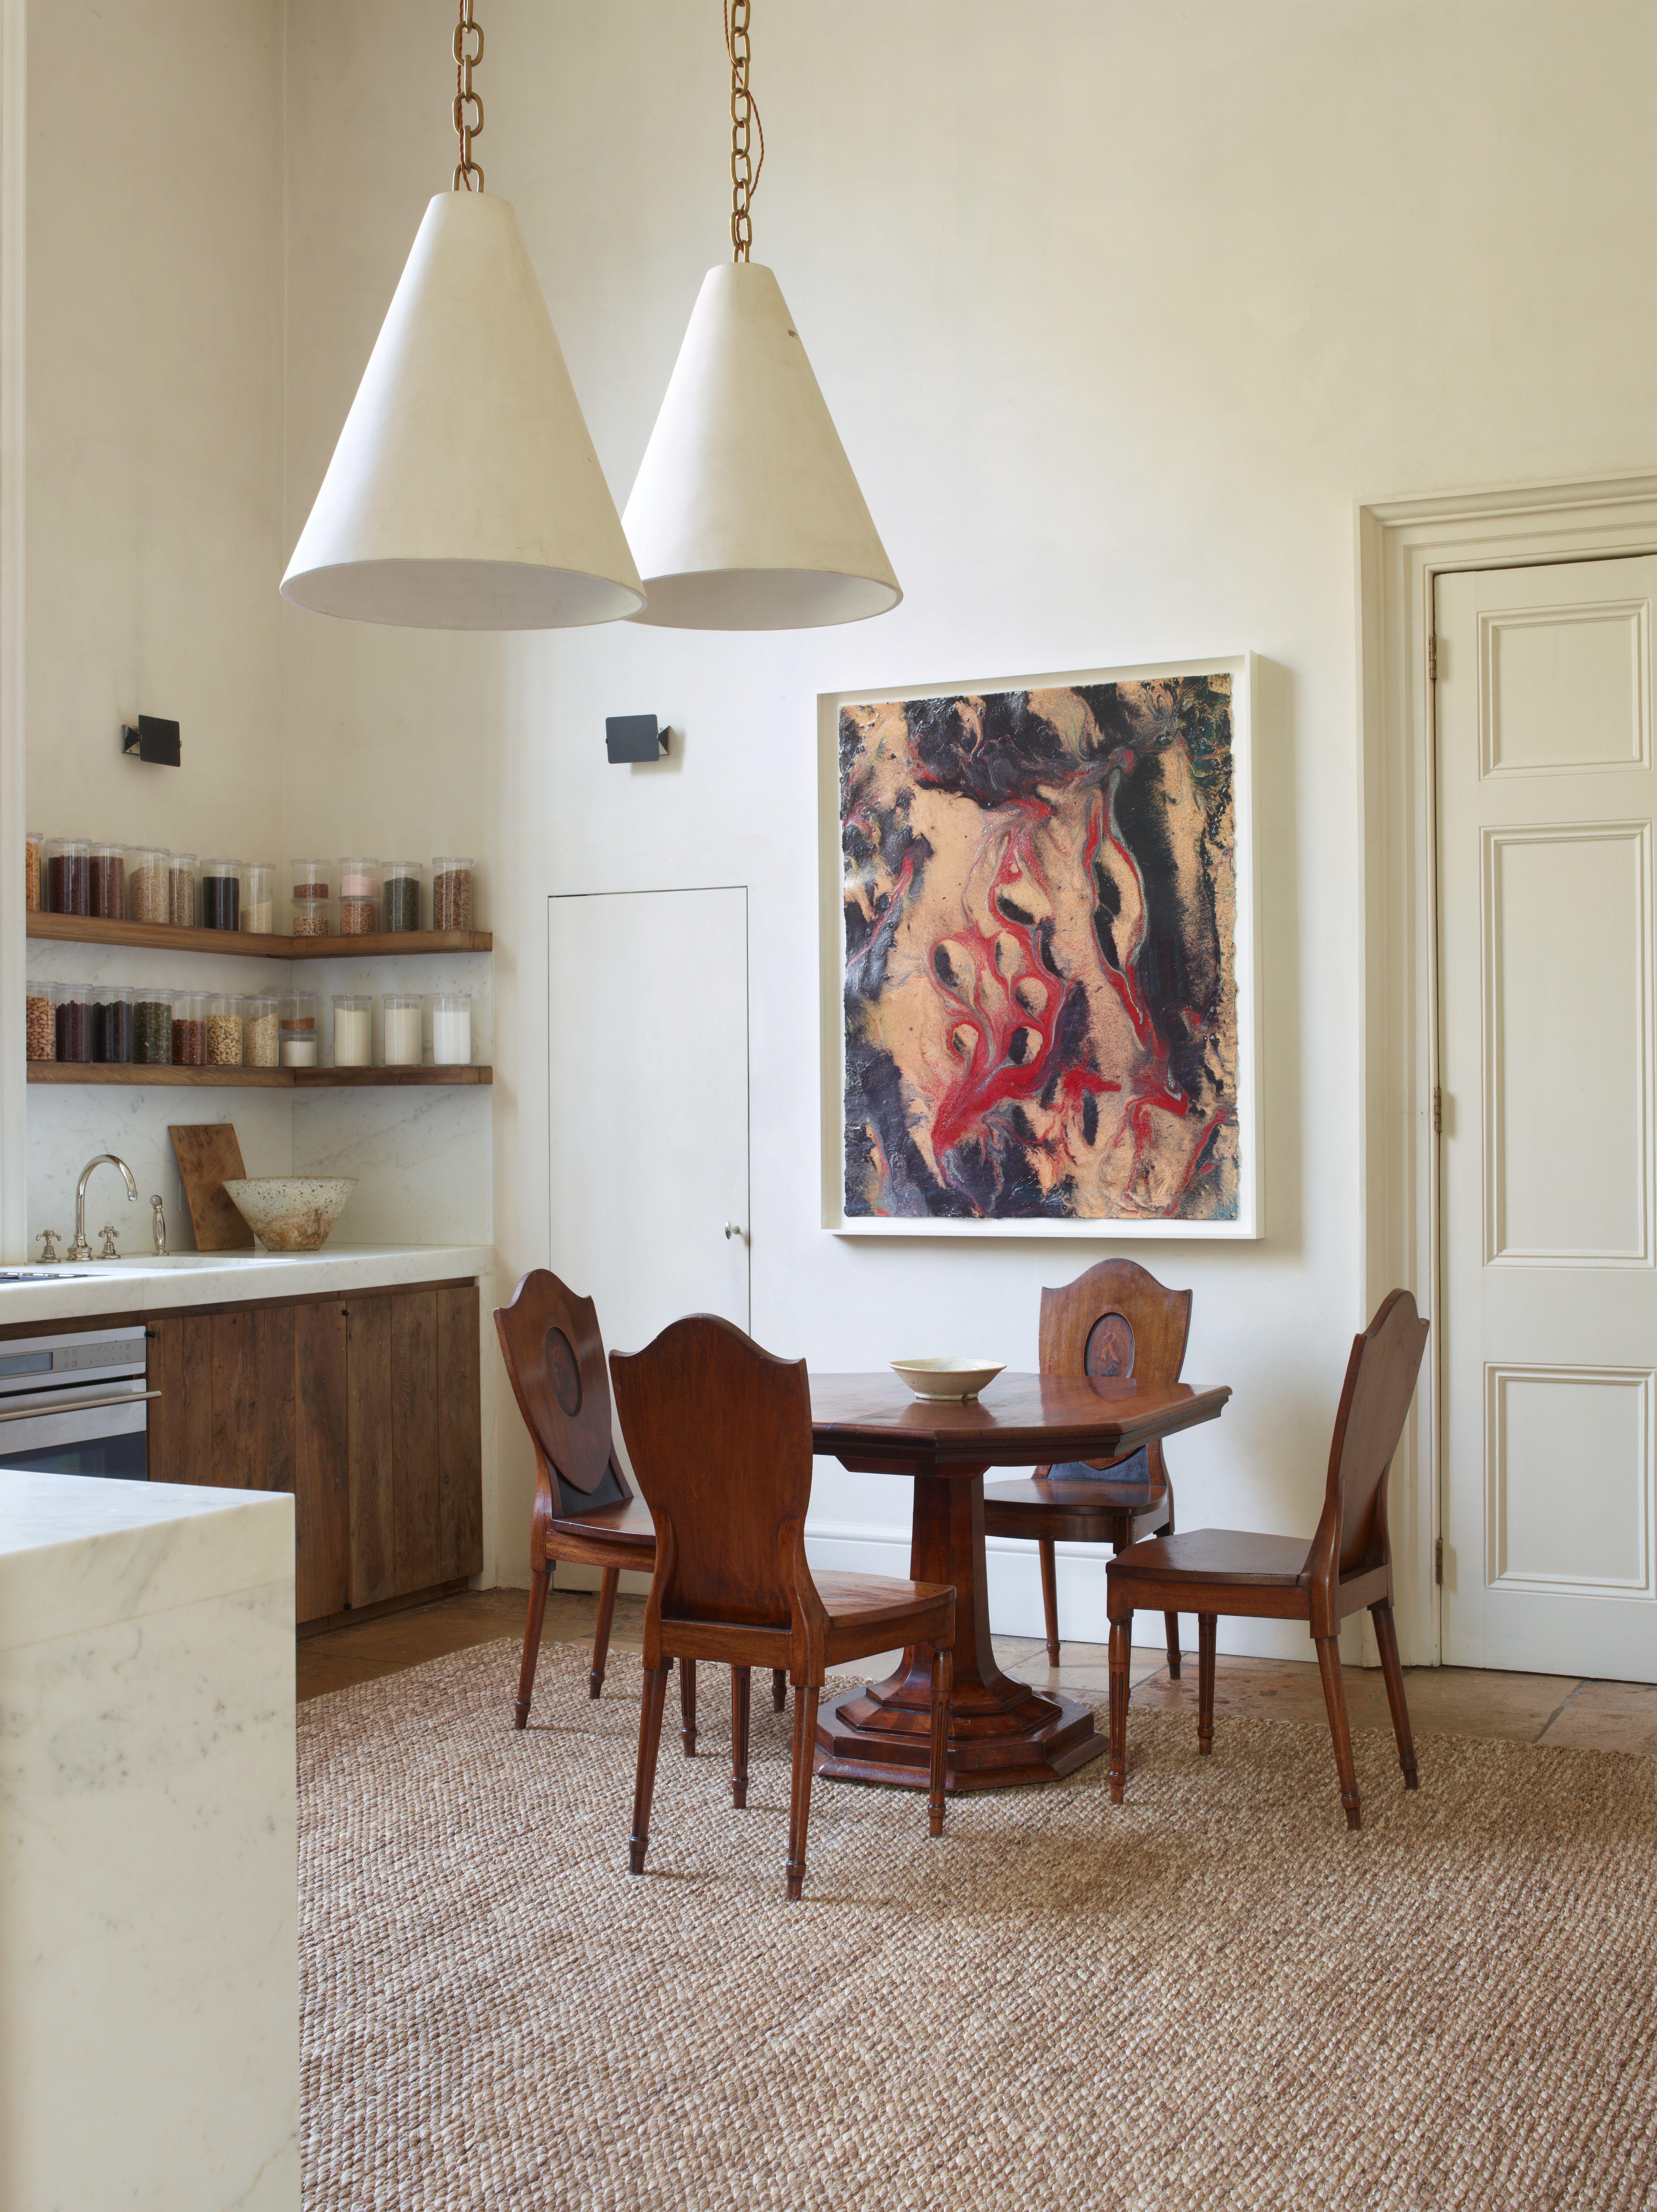 4 gorgeous interiors by rose uniacke studio ltd photos architectural digest